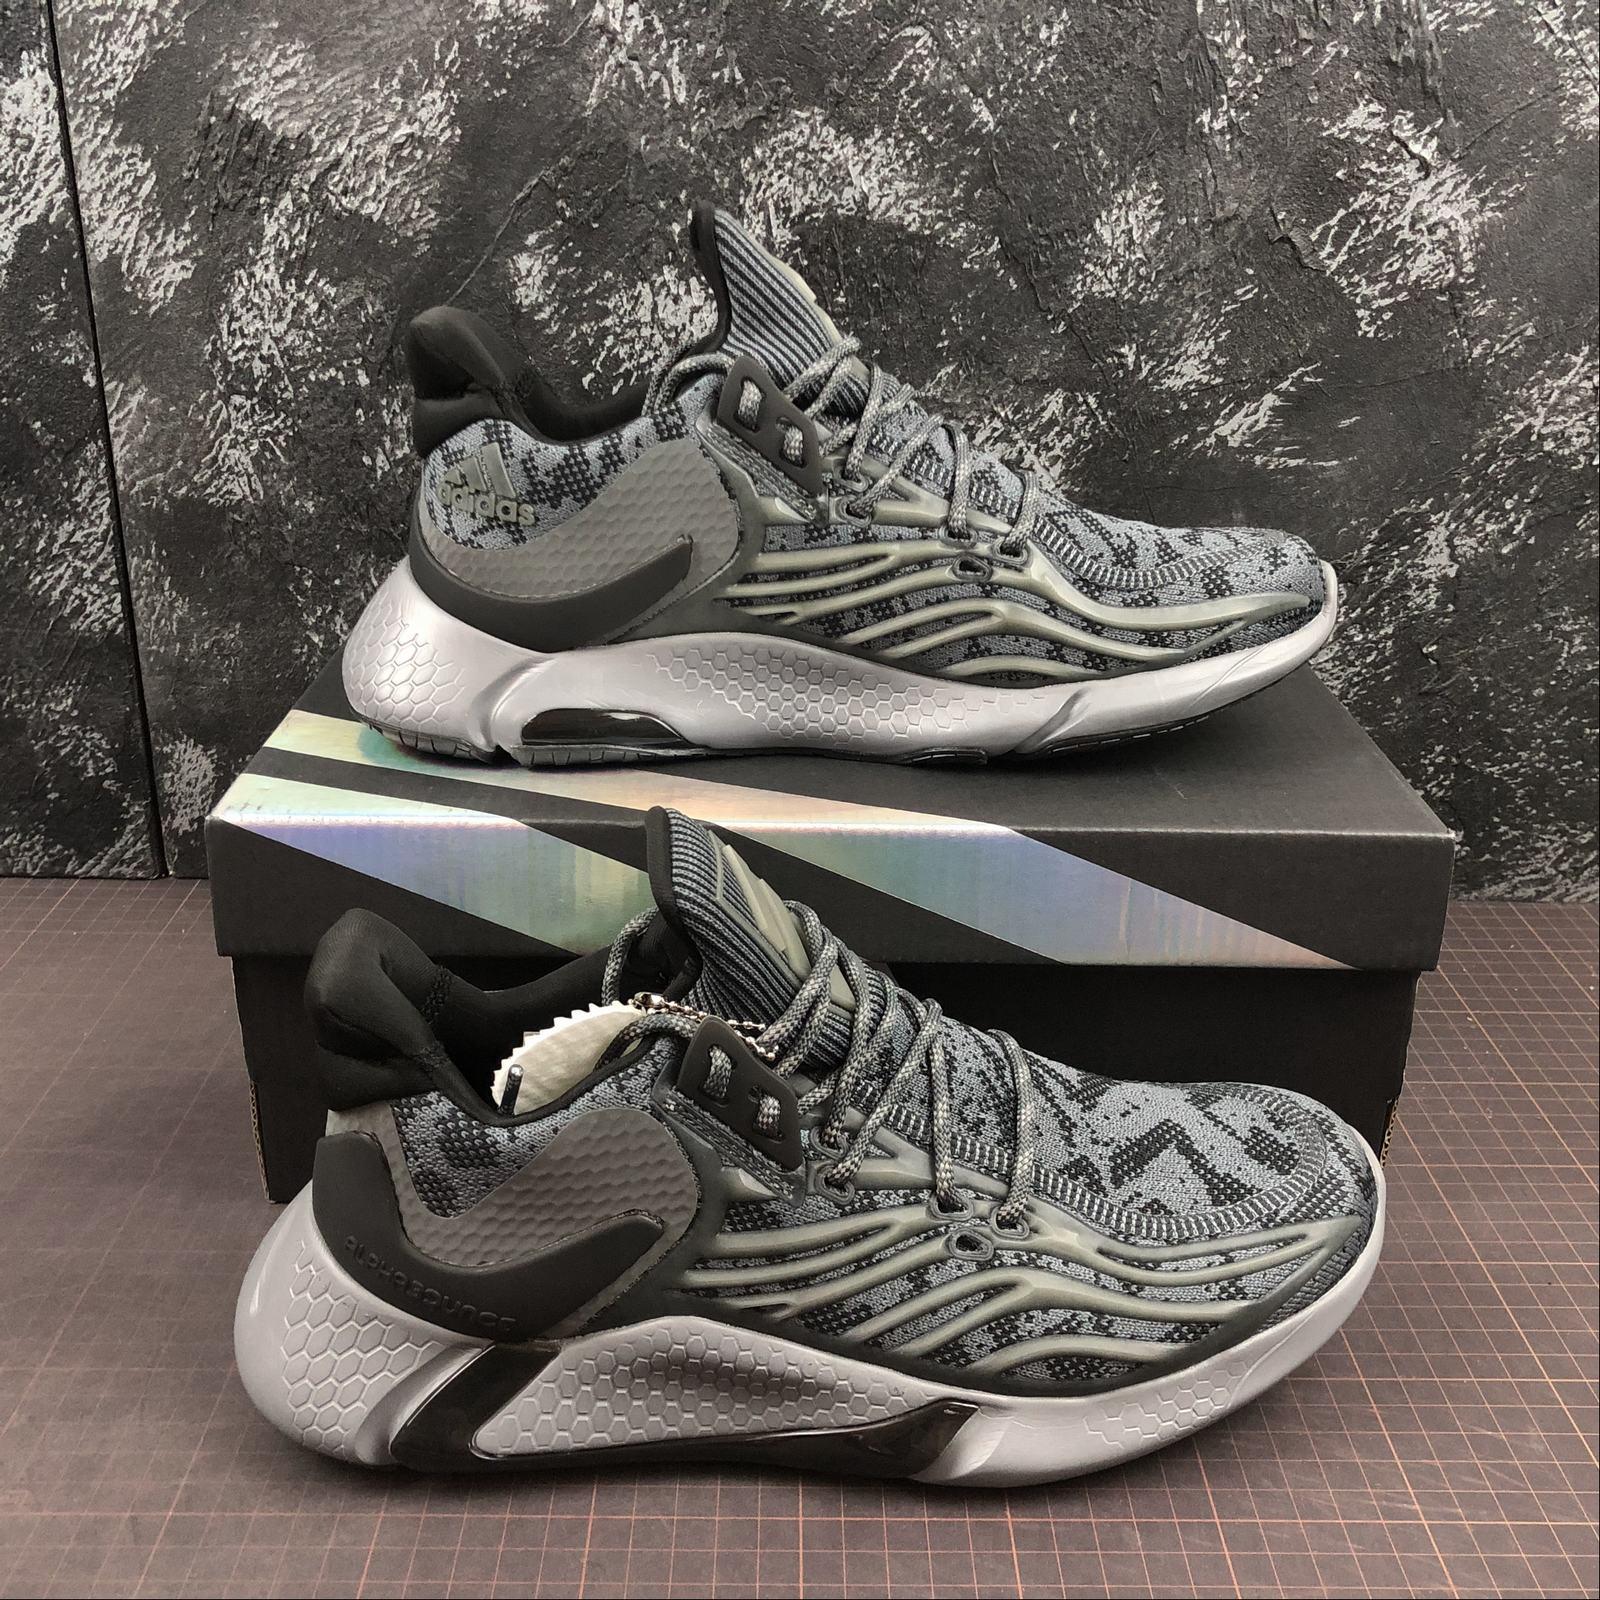 giay-sneaker-adidas-alphabounce-yeezy-boost-3m-ay6680-doi-mau